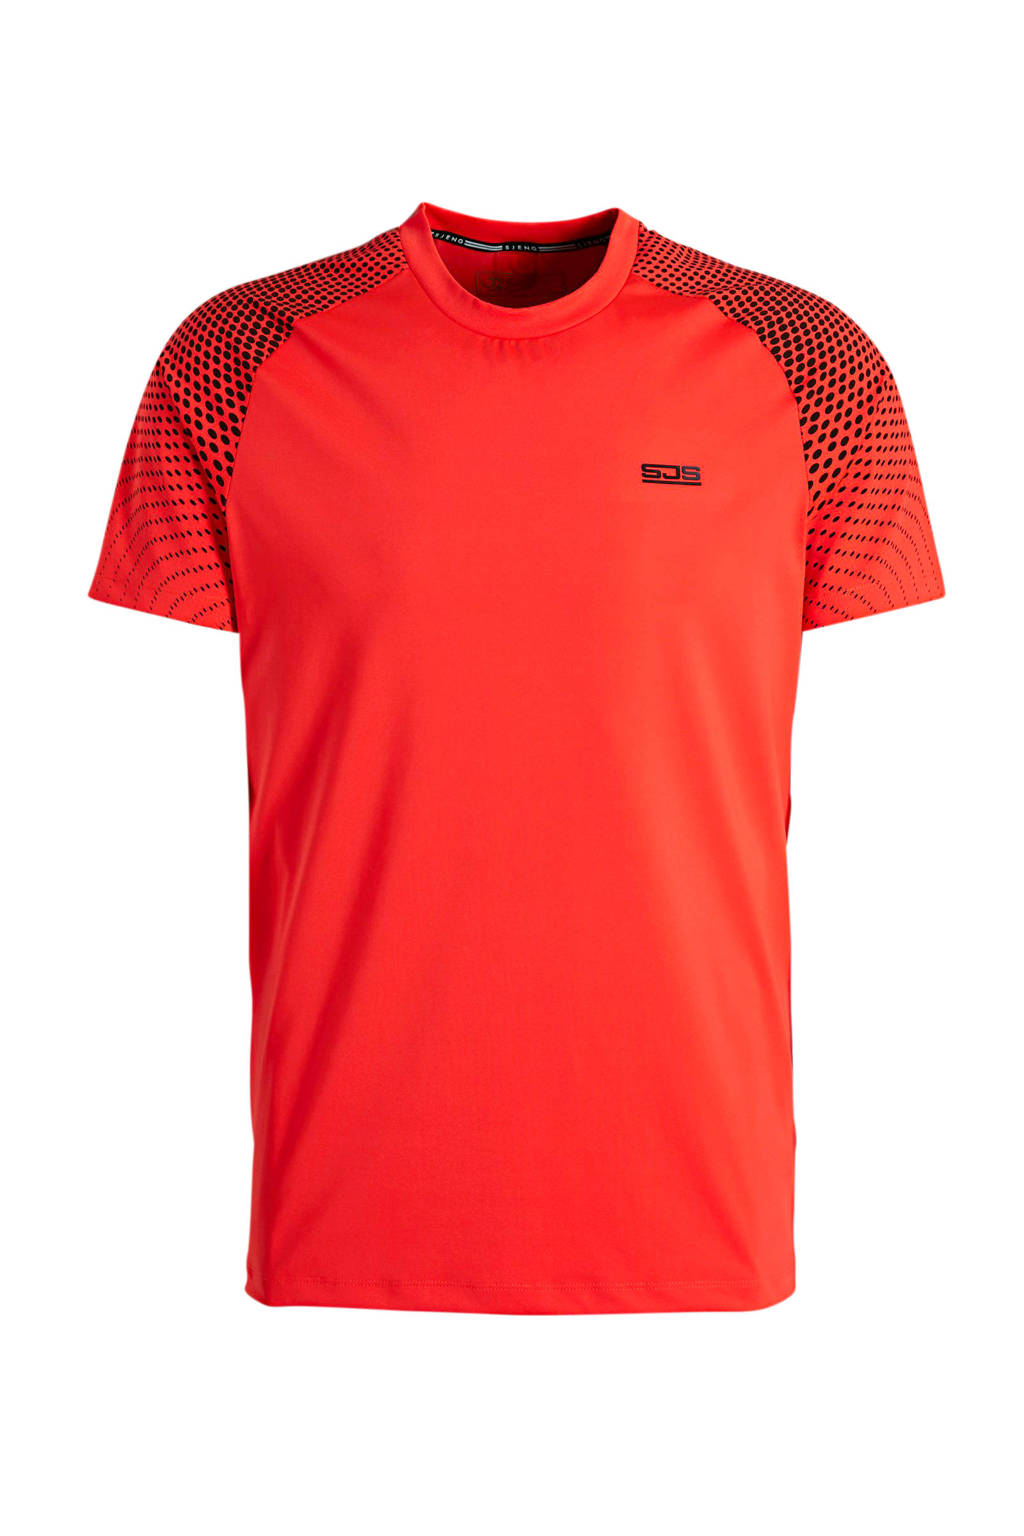 Sjeng Sports   T-shirt oranje, Oranje